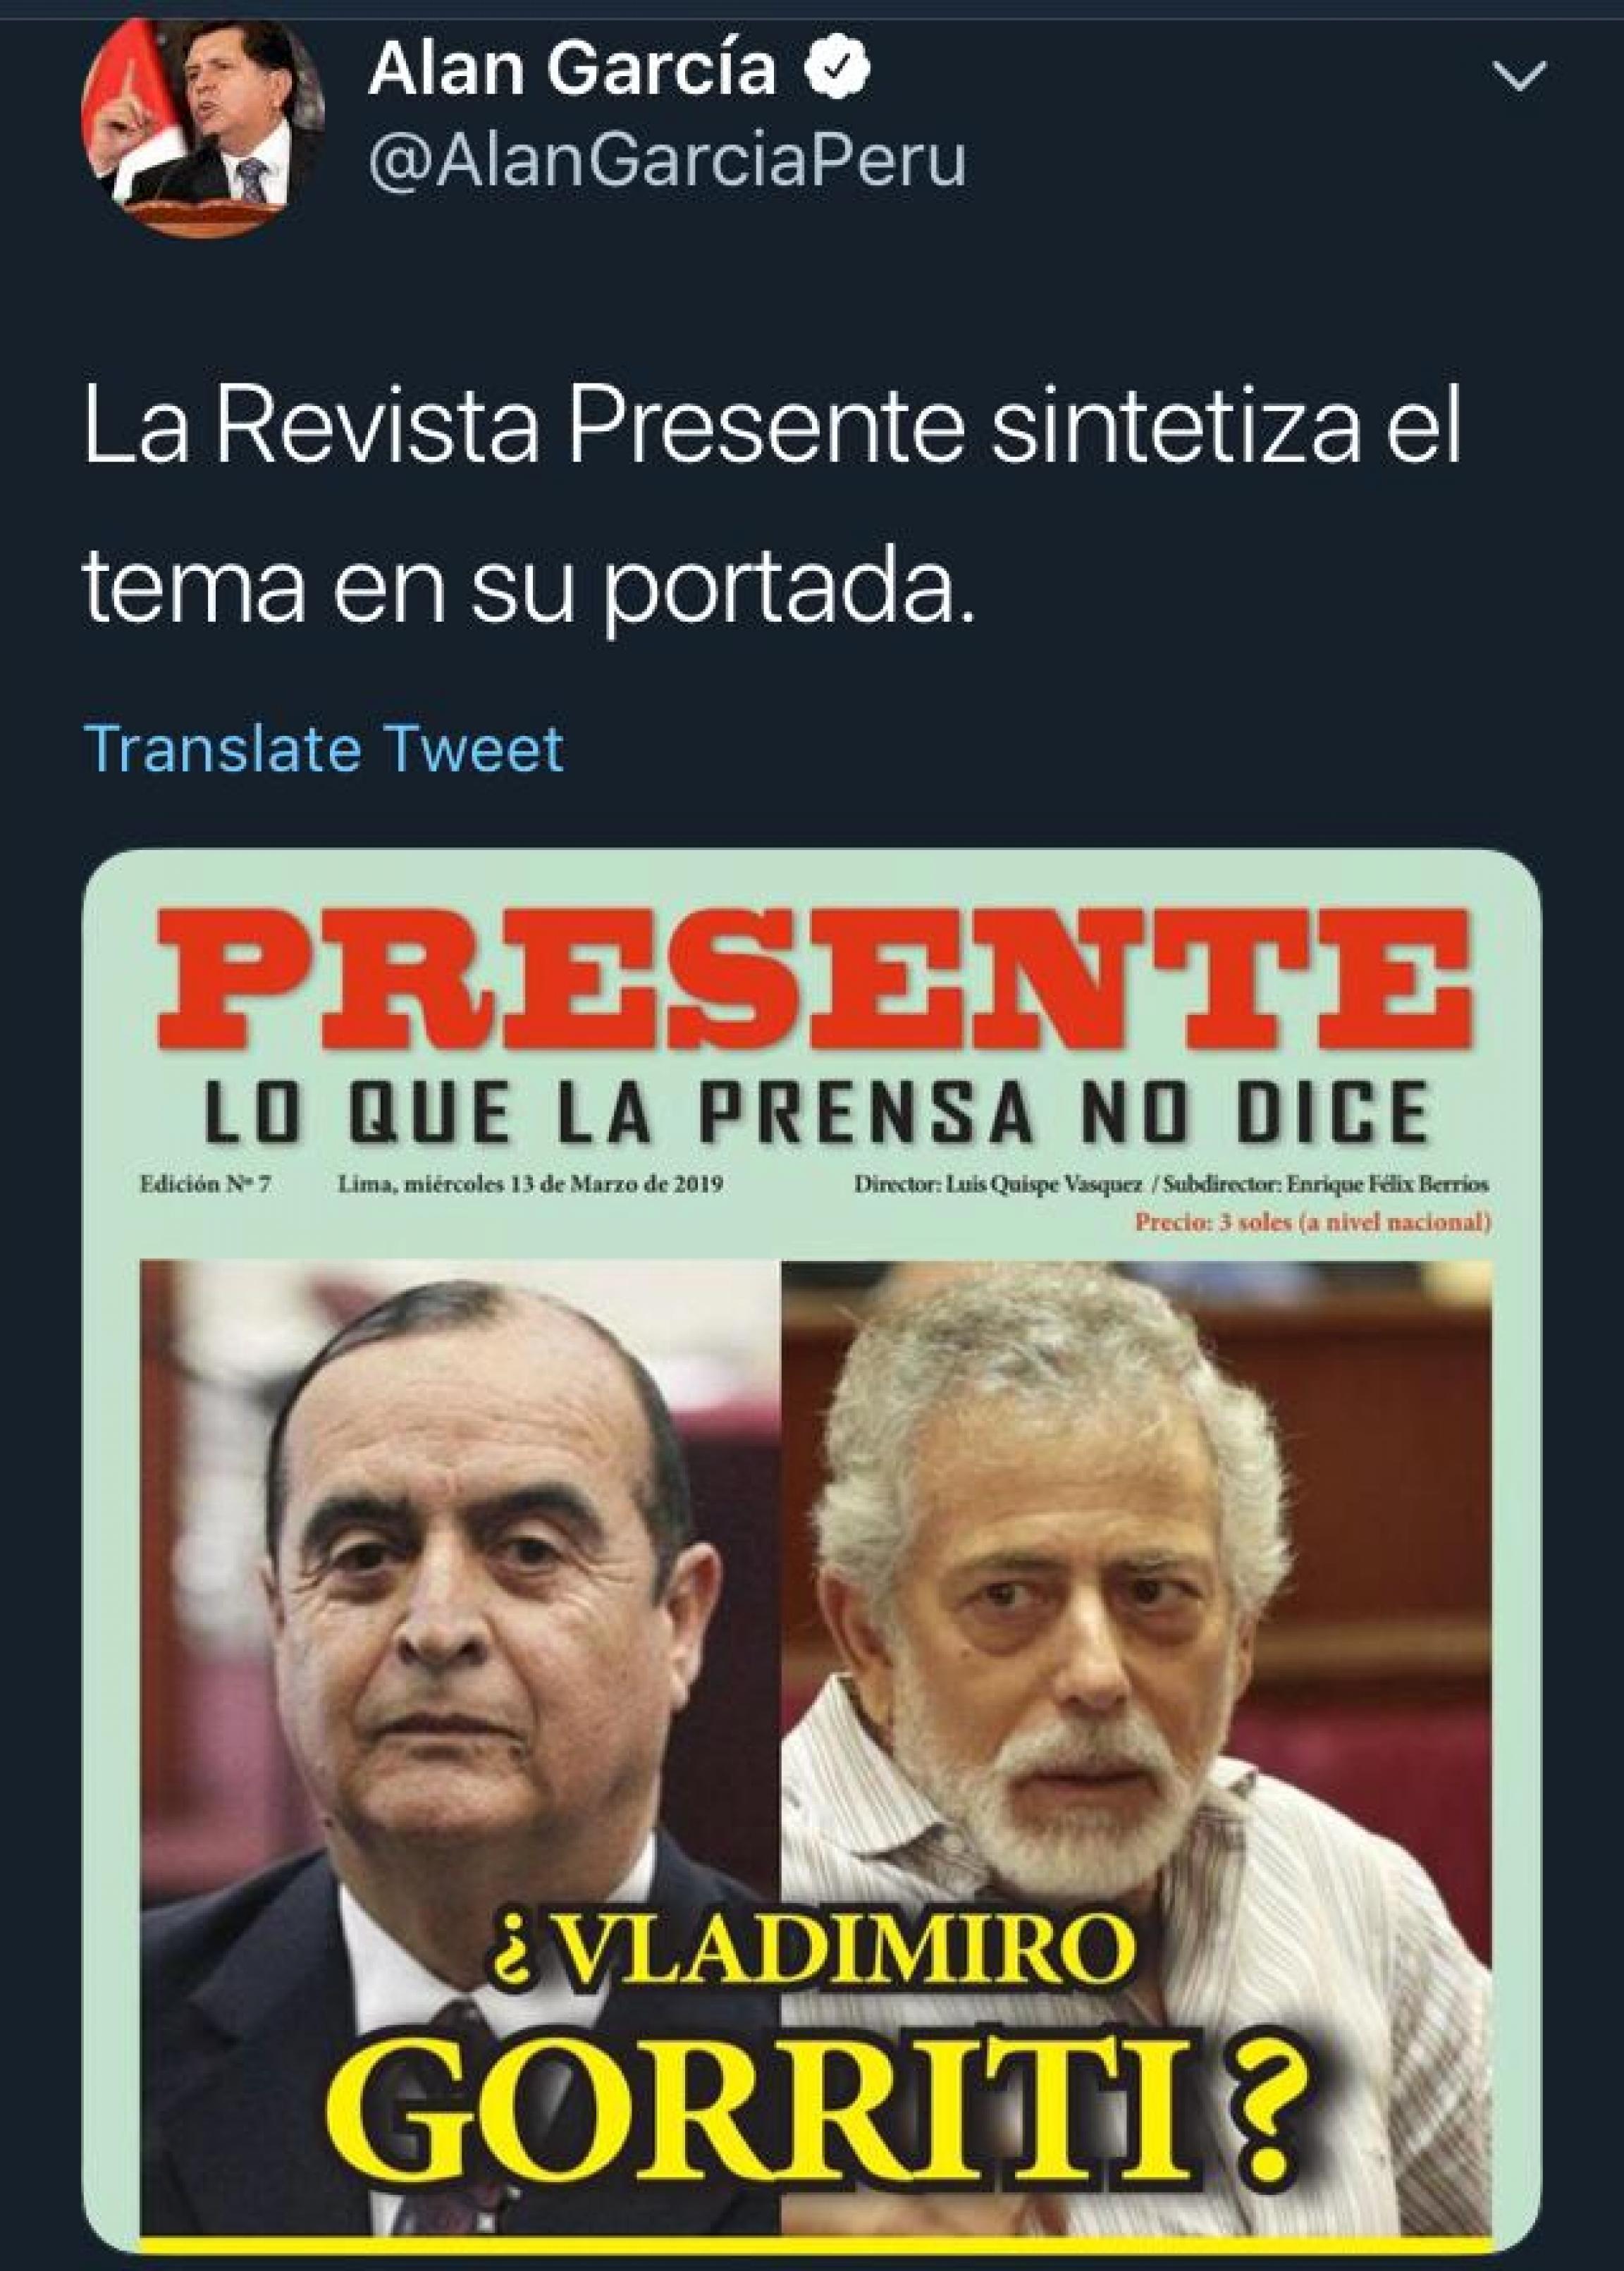 peru tweet